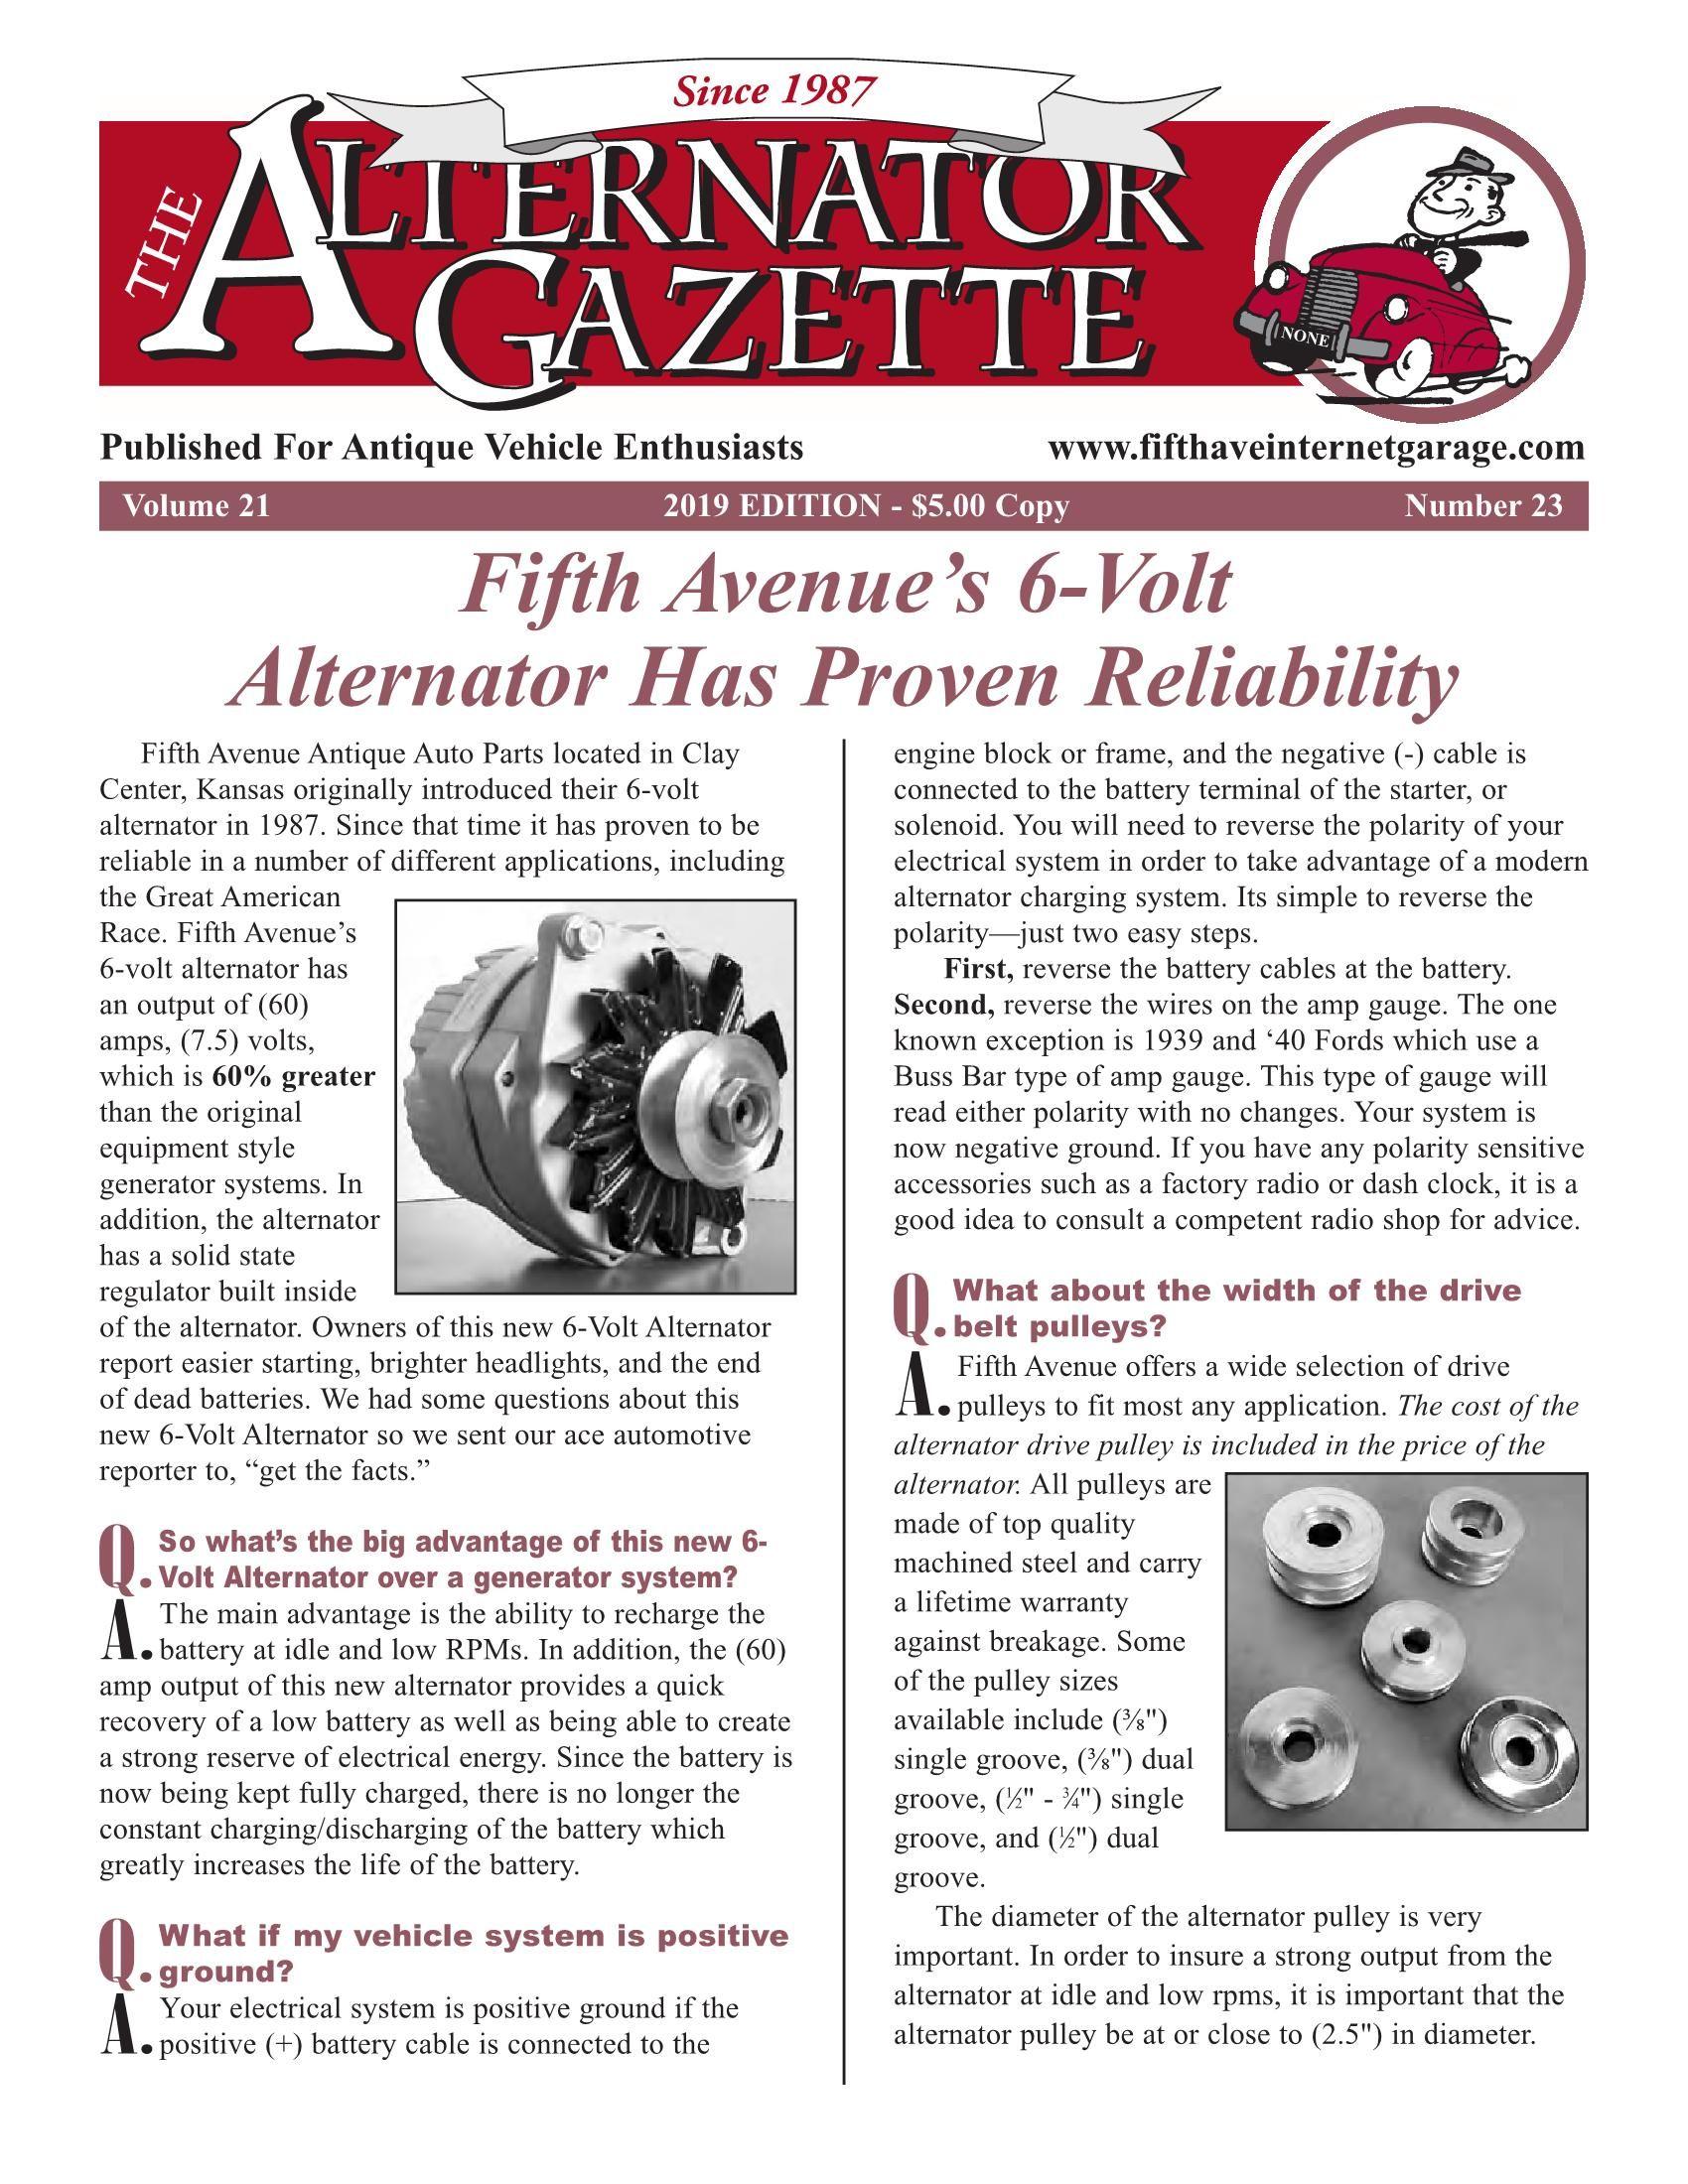 hight resolution of alternator gazette